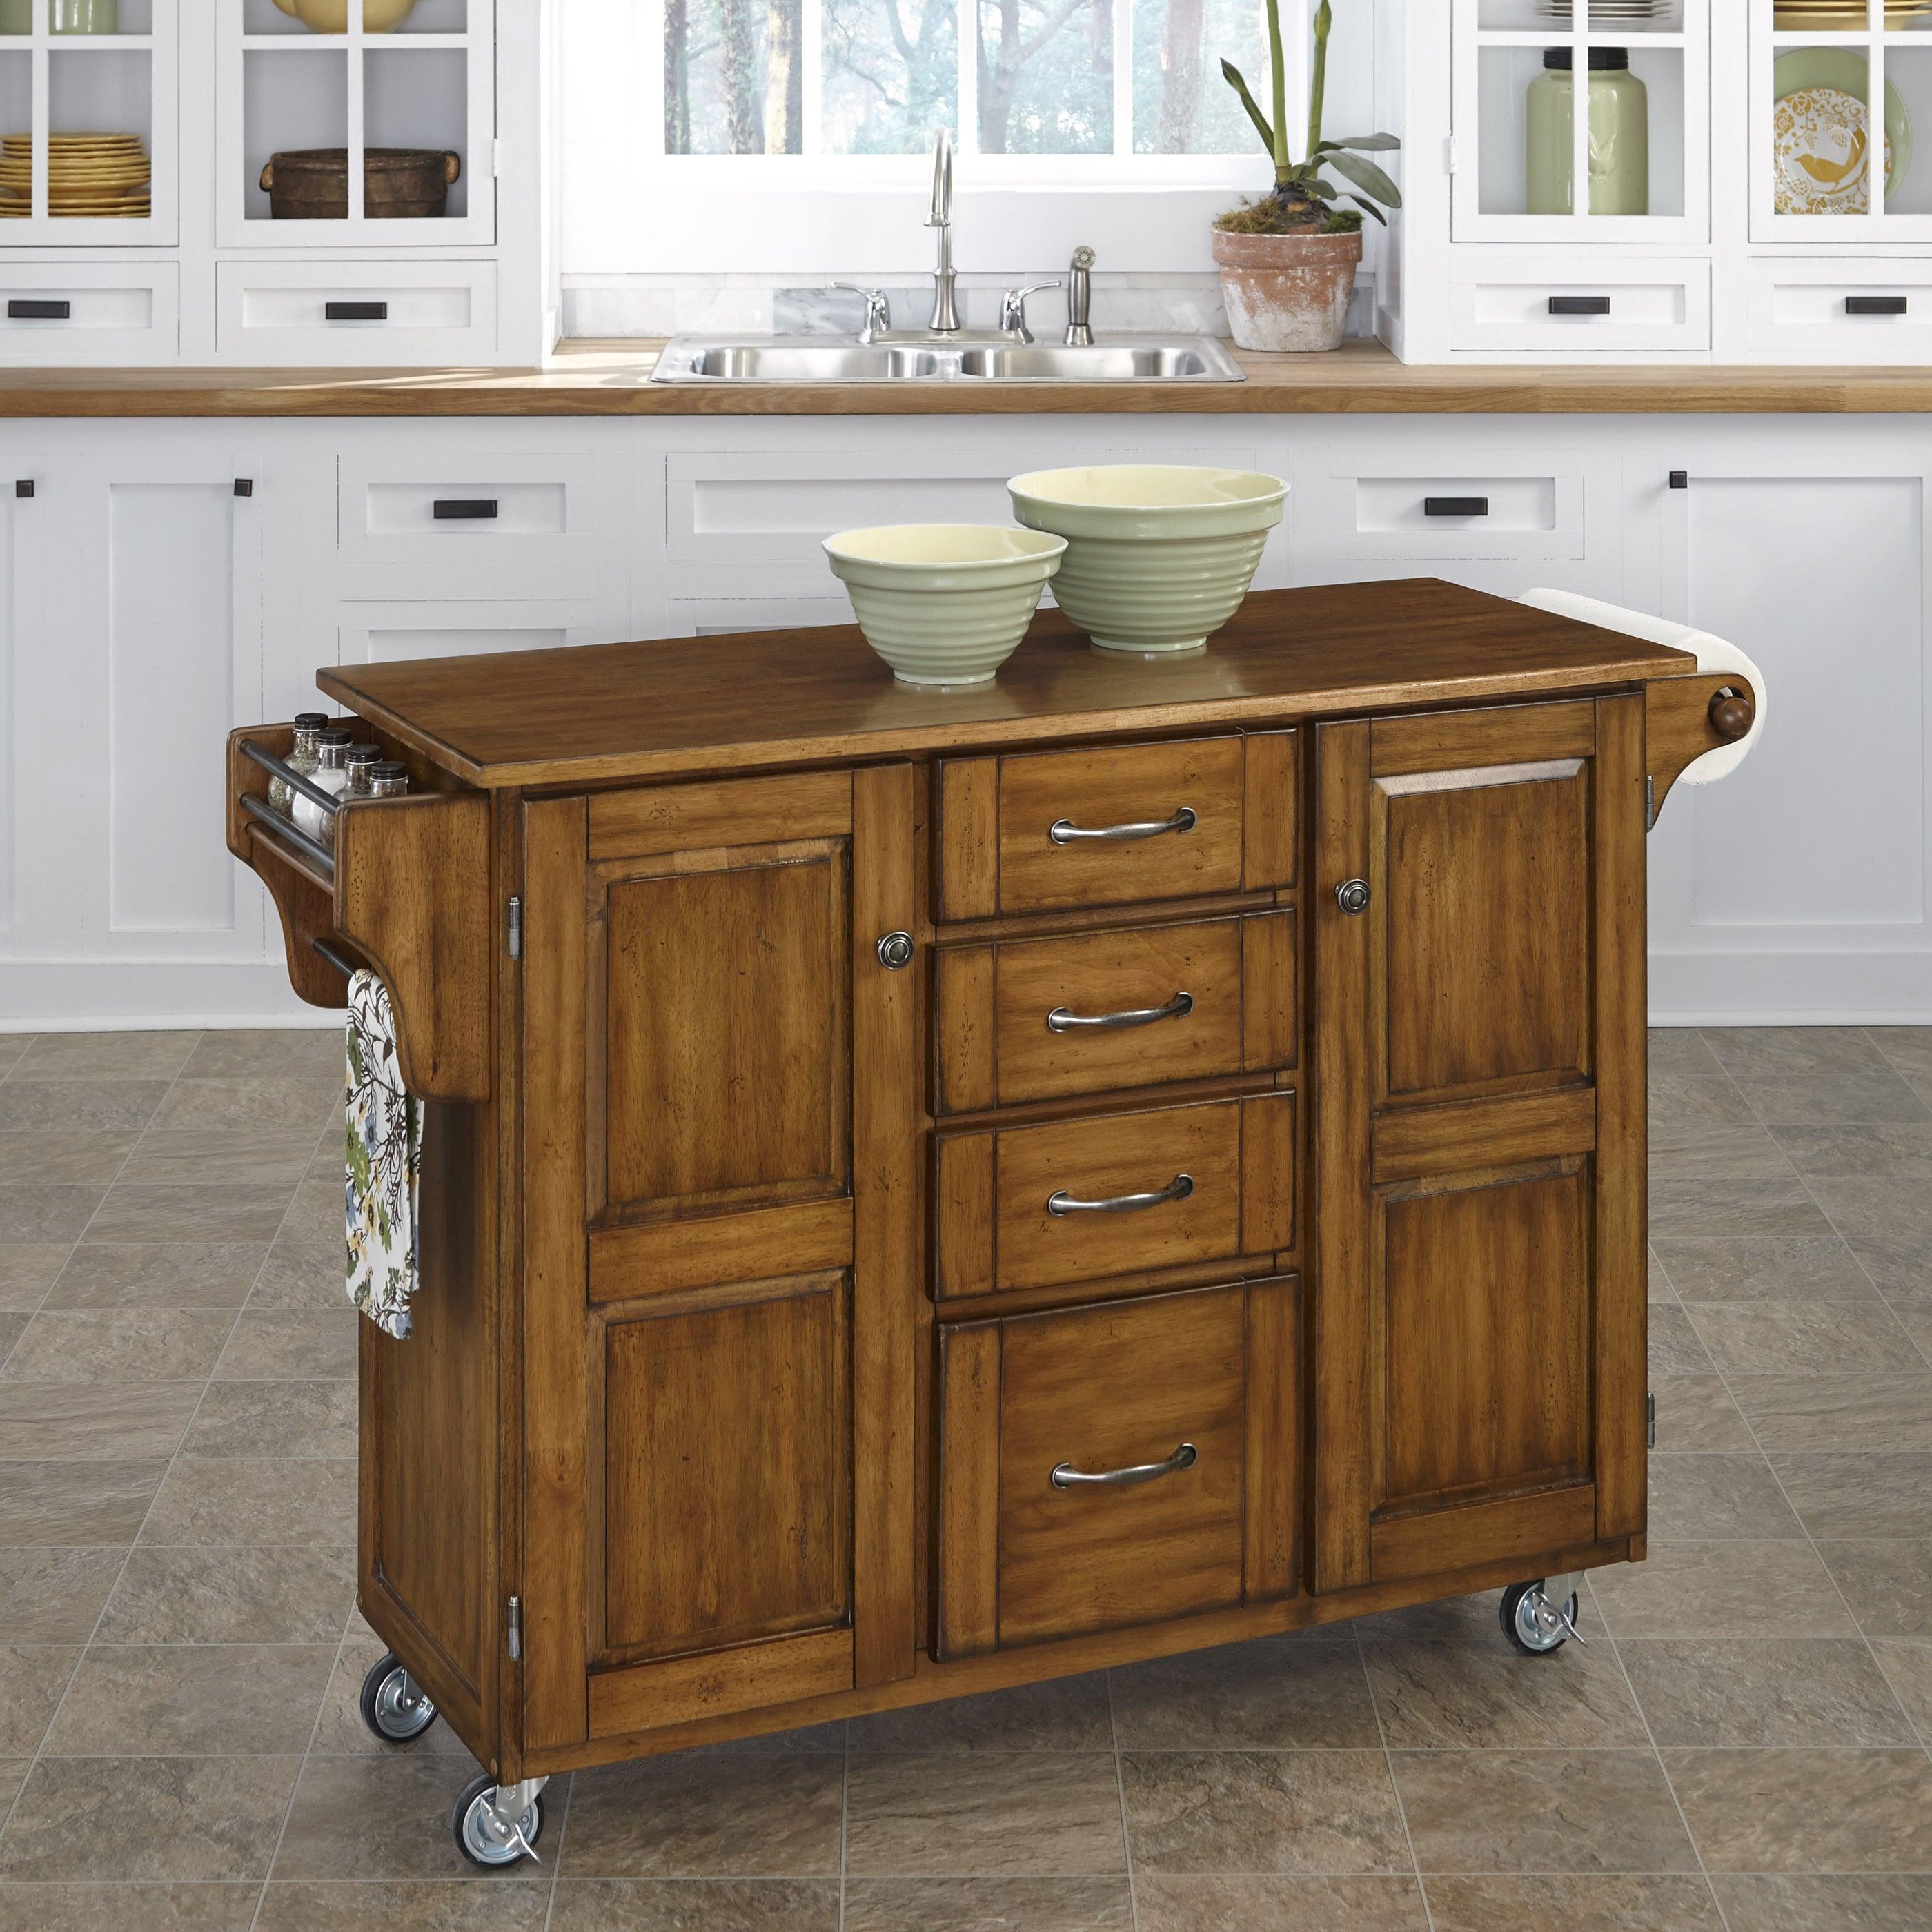 Shop Simple Living Rolling Galvin Microwave Cart: Shop Gracewood Hollow Defoe Oak Finish Kitchen Cart